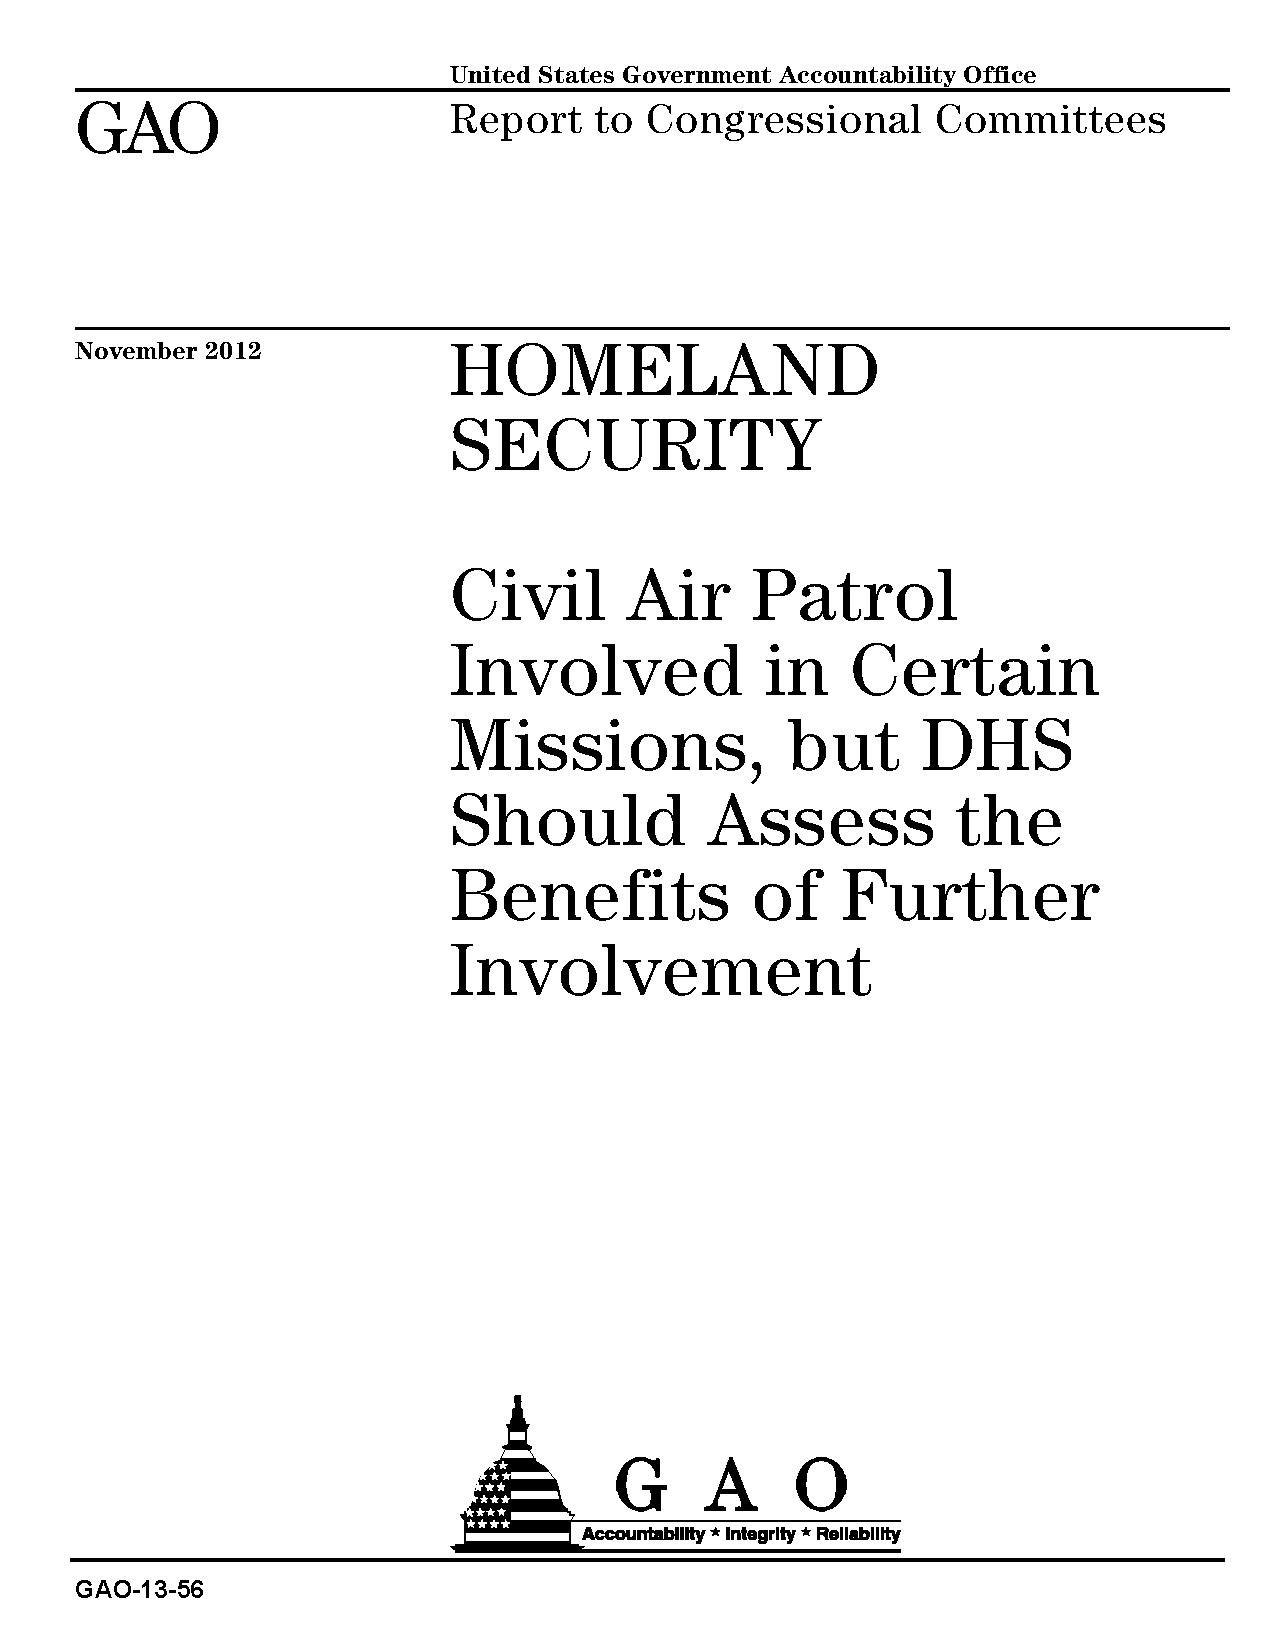 b77c580de74 File GAO Report - Civil Air Patrol Involved in Certain Missions